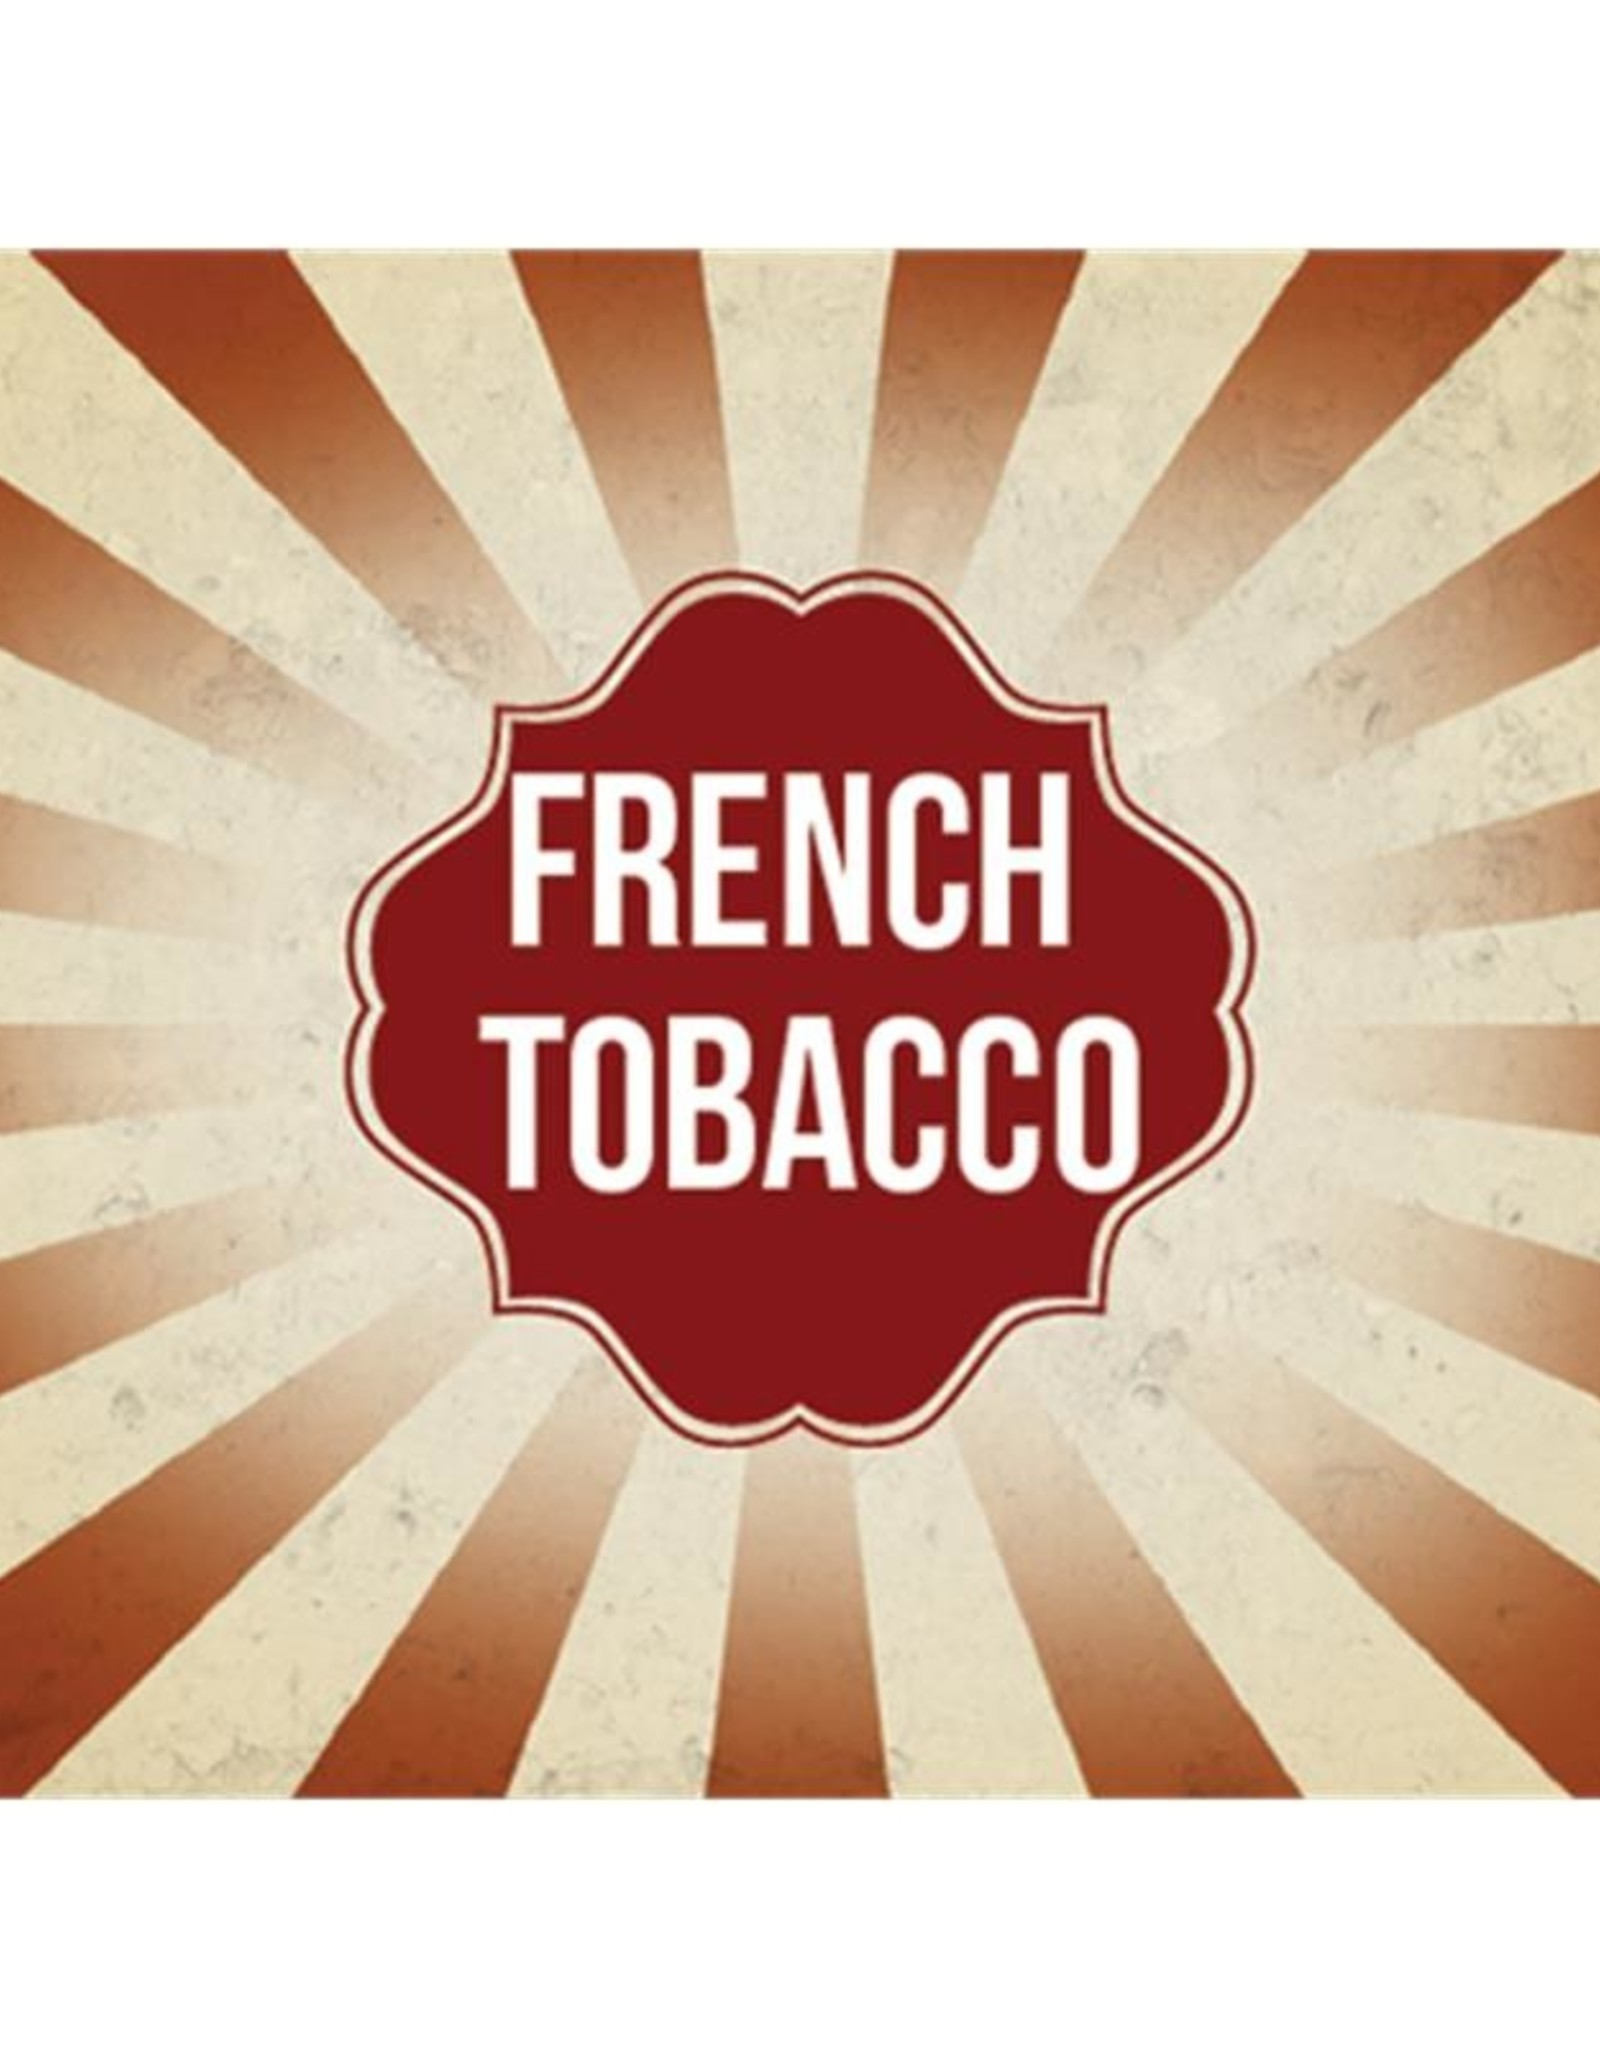 Cirkus Authentic Cirkus French Tobacco 3 mg Nicotine